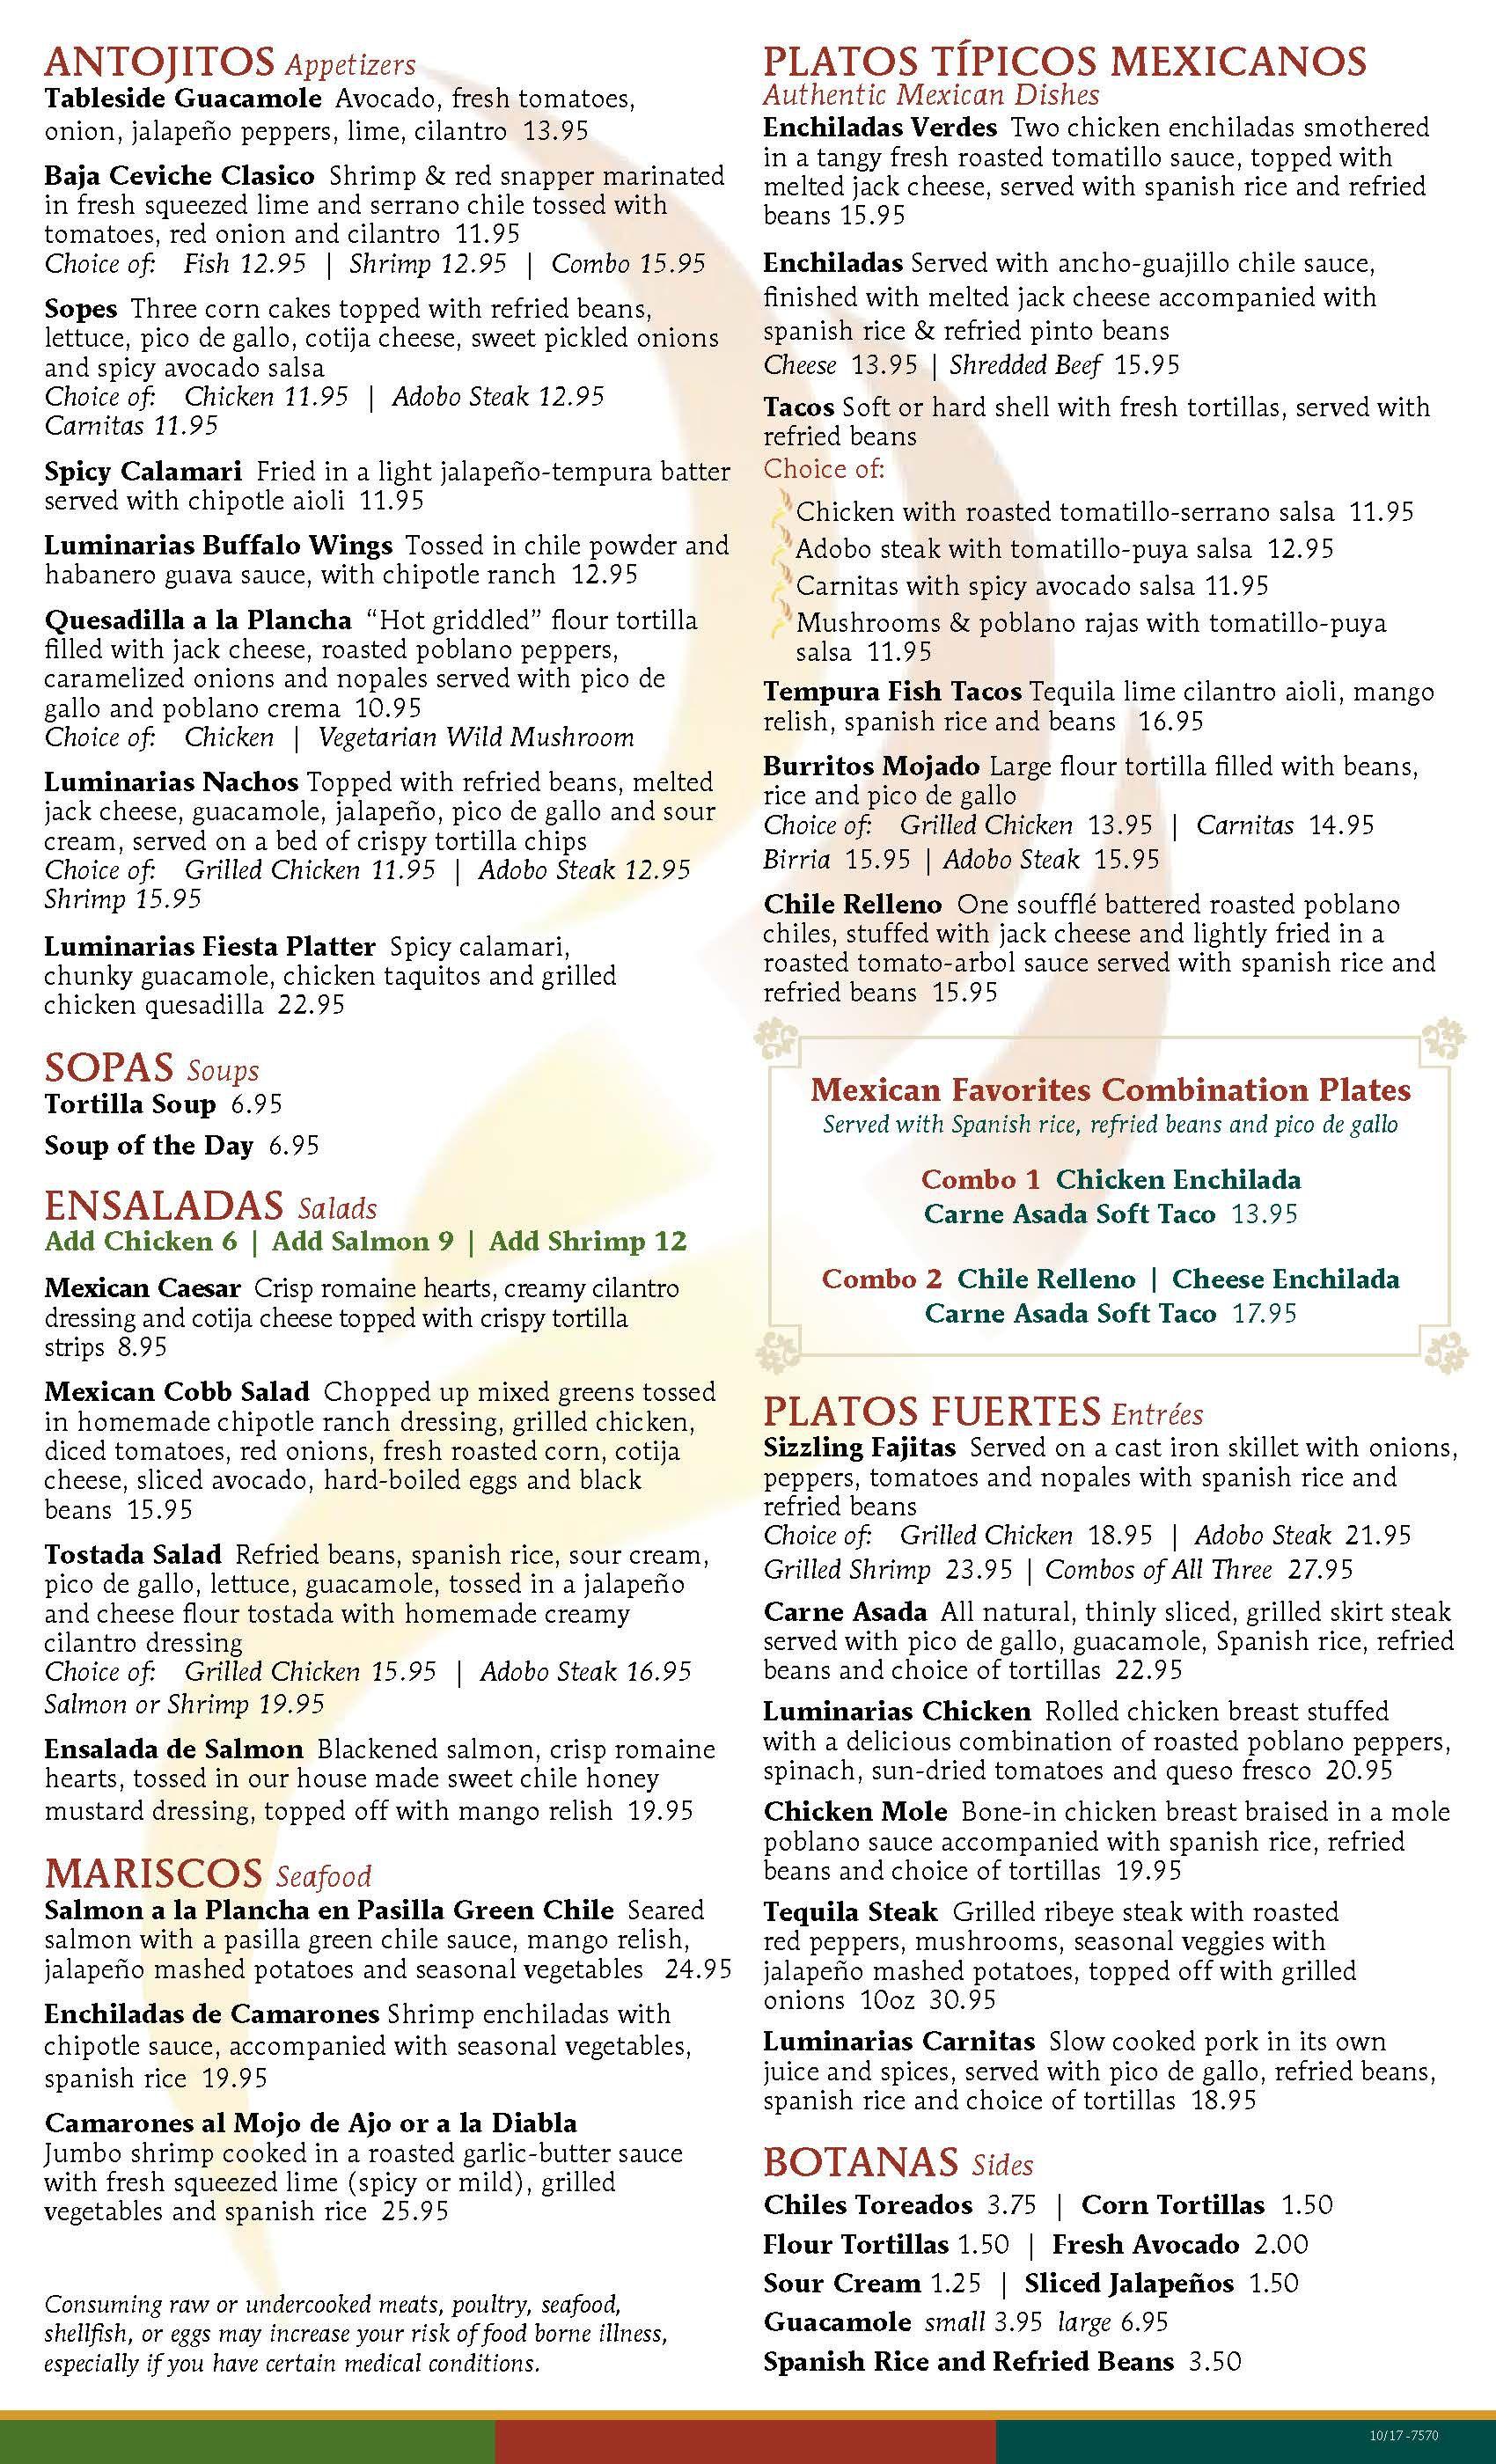 Lunch & Dinner Menu - Luminarias Restaurant